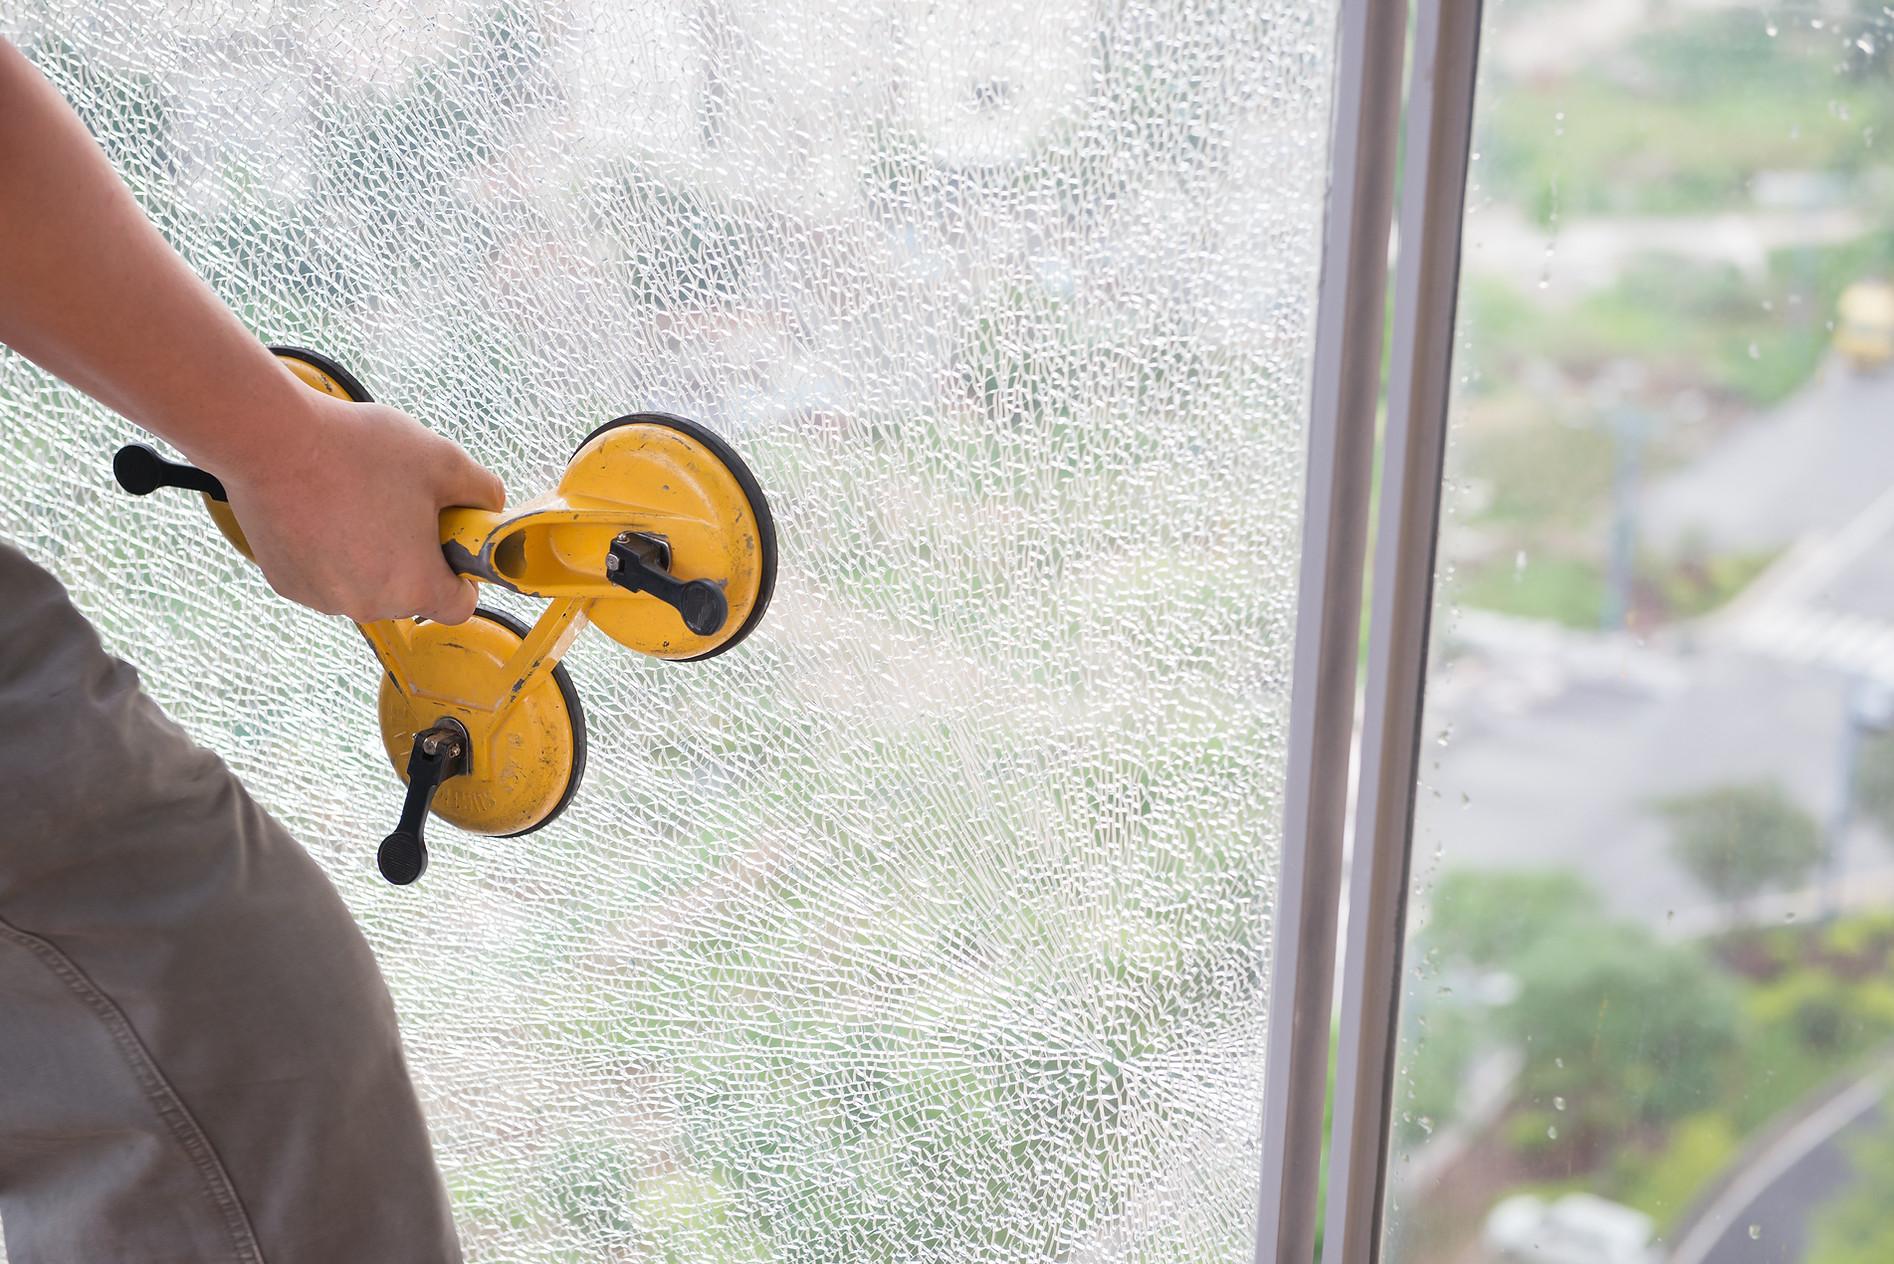 Reparación de vidrios rotos